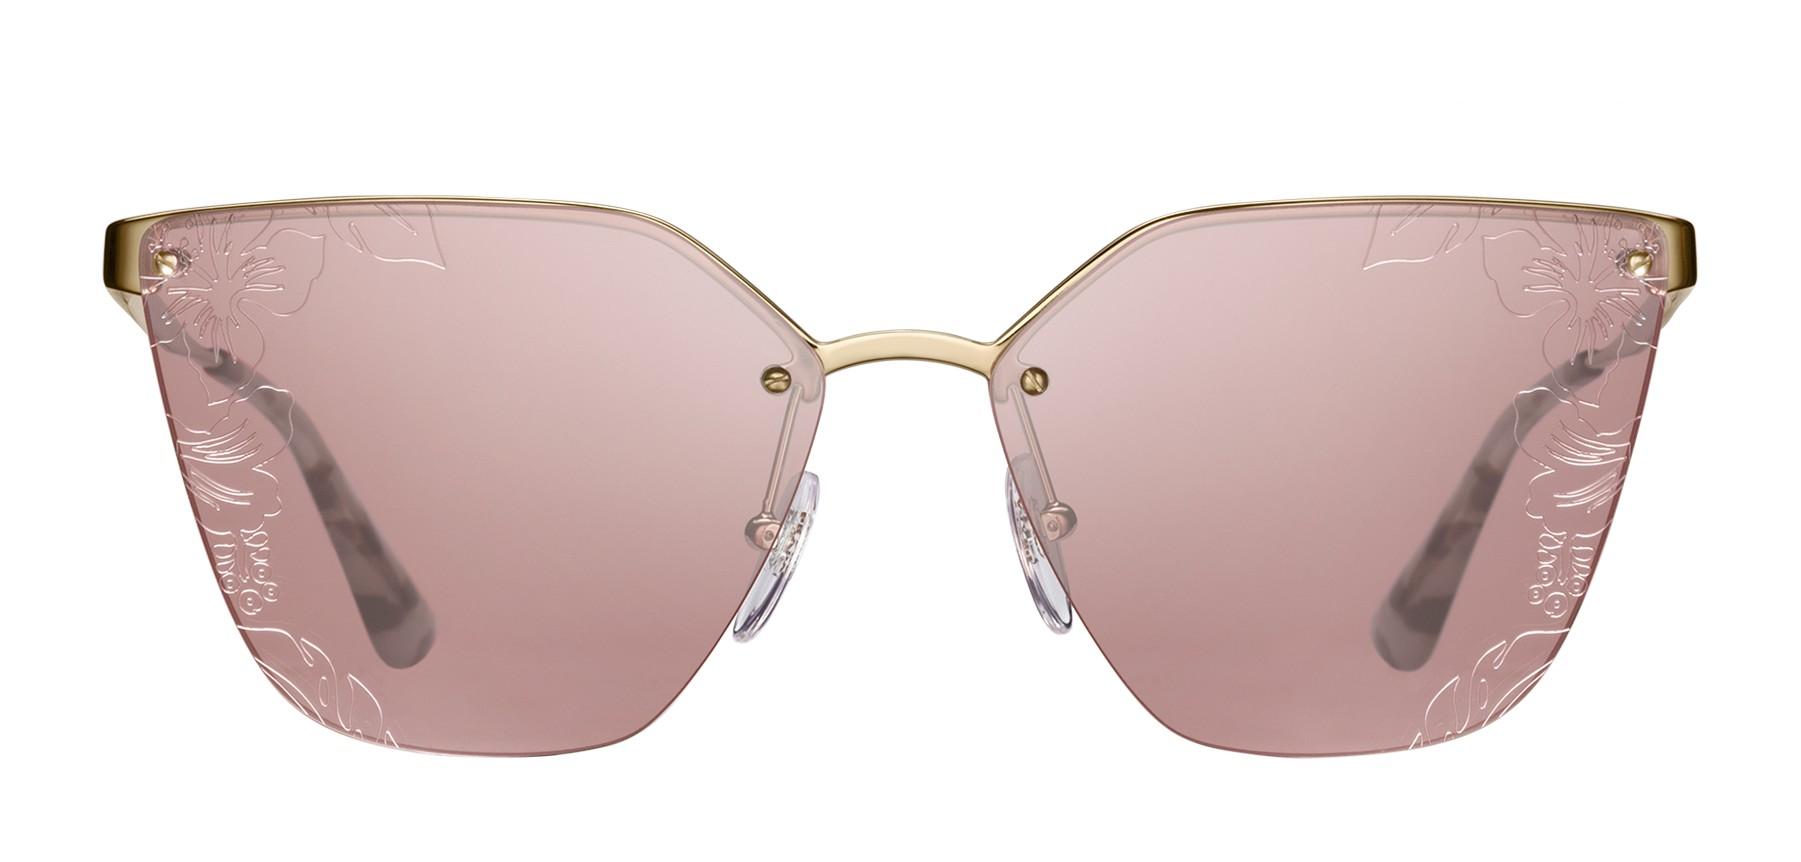 7522239d24f6 Prada - Prada Cinéma - Dark Gold Irregular Cat Eye Sunglasses - Prada  Cinéma Collection - Sunglasses - Prada Eyewear